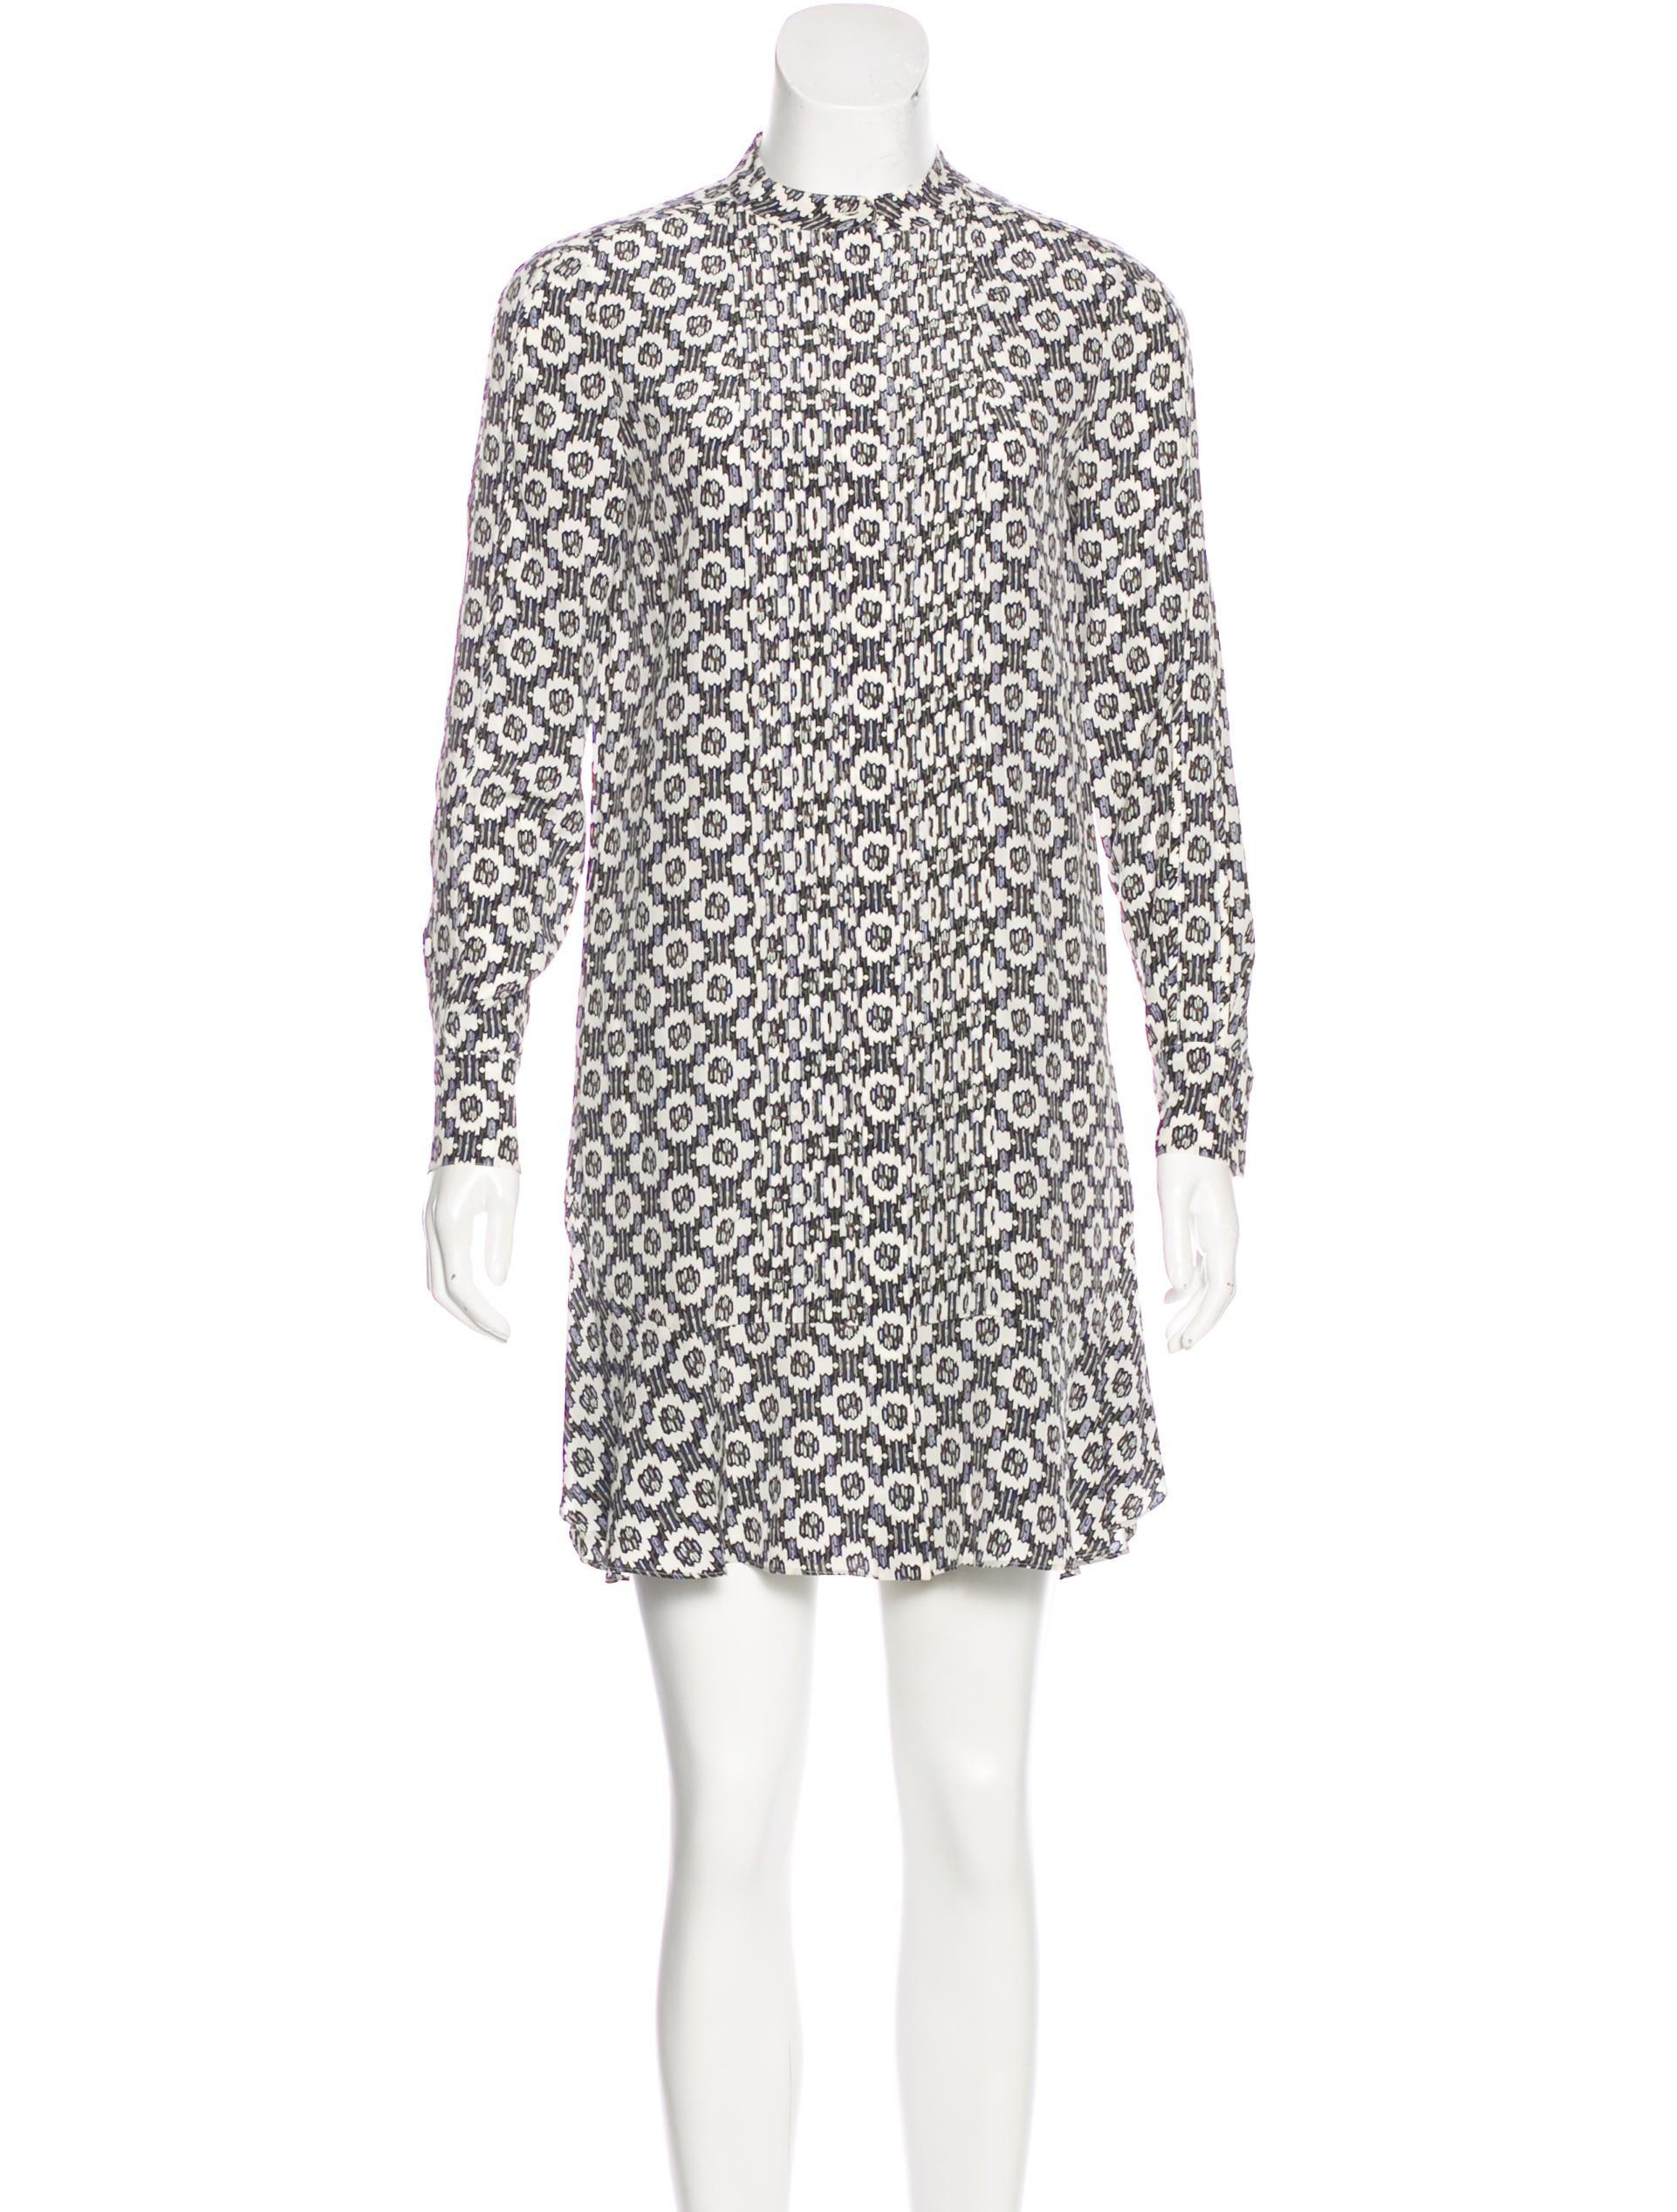 fd9bdd1c8909 Tory Burch Silk Shirt Dress - Clothing - WTO121385